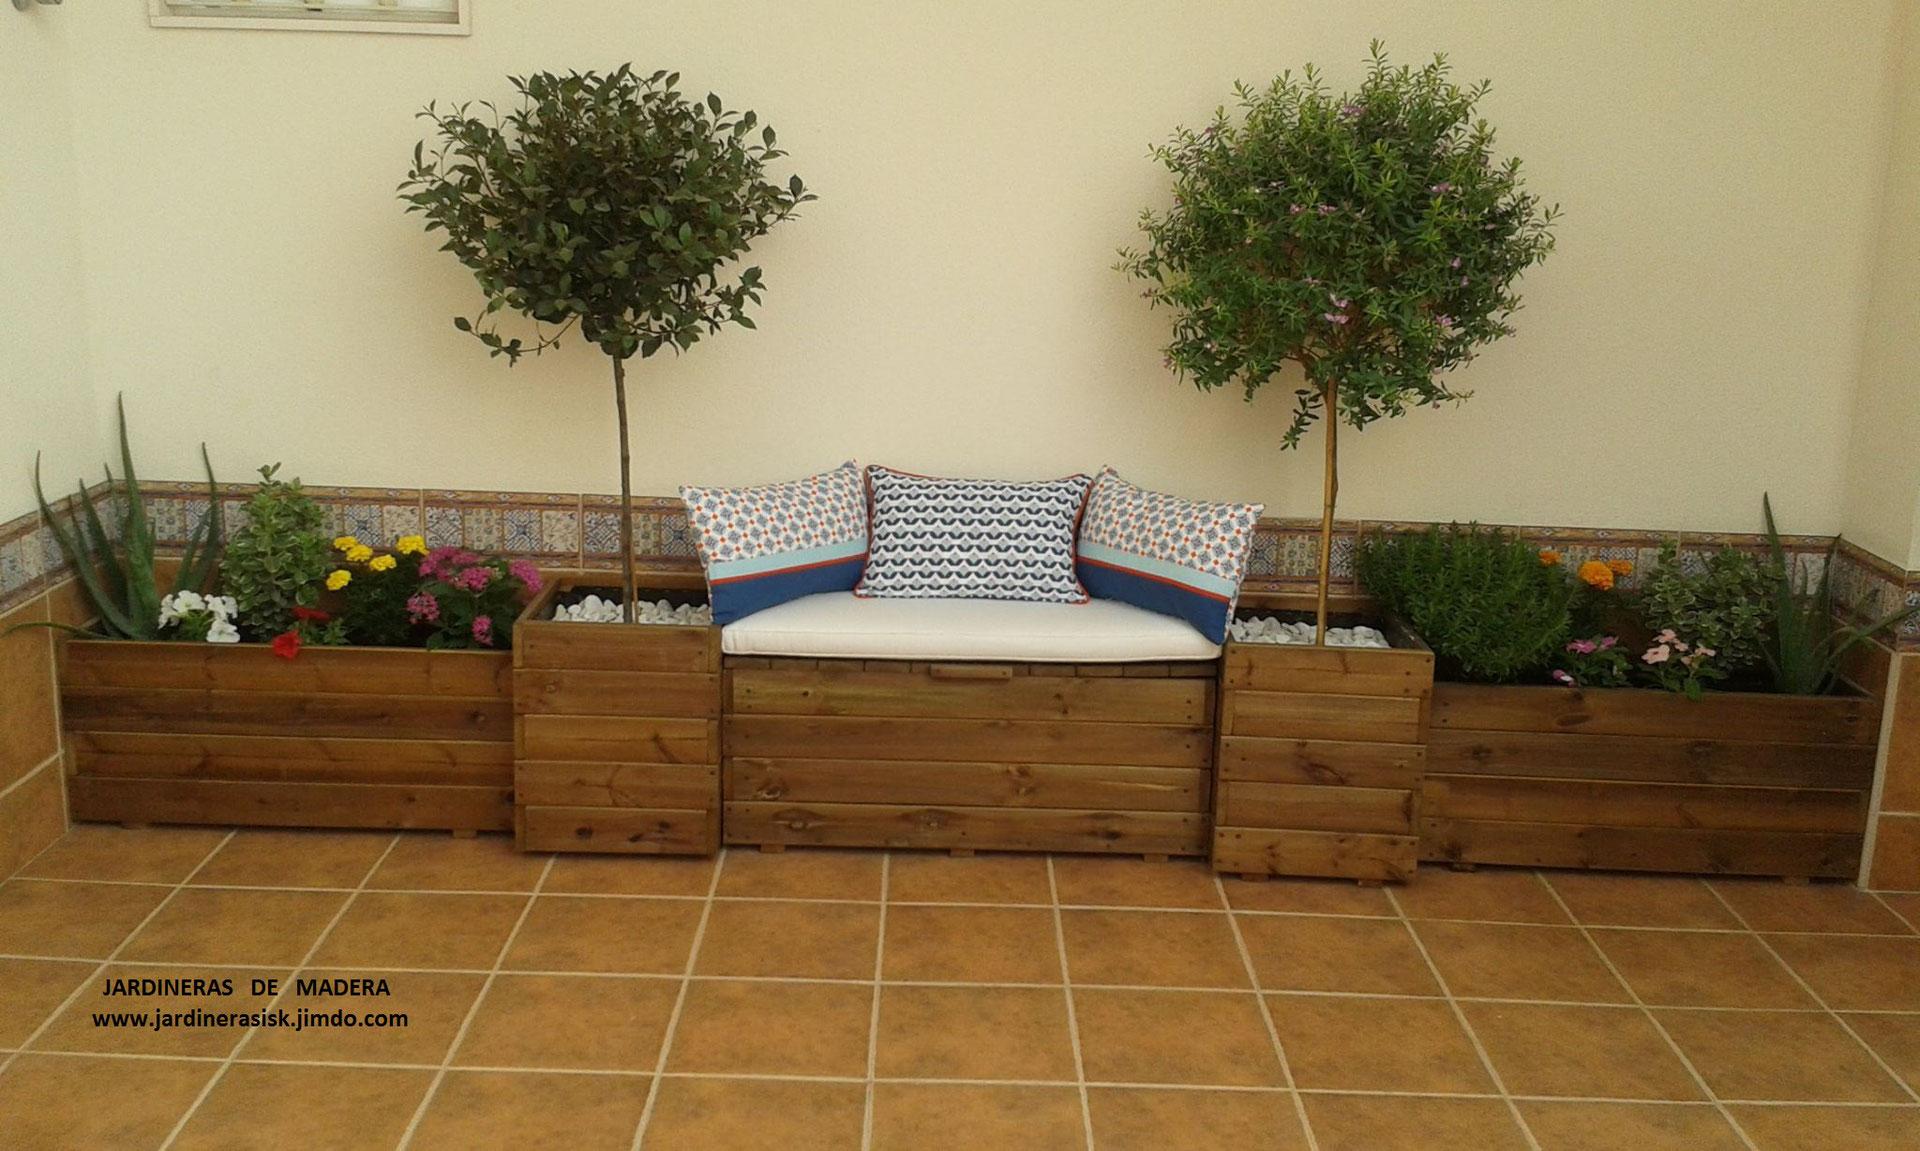 Jardineras de madera celosias baules huertos urbanos - Jardineras de exterior ...